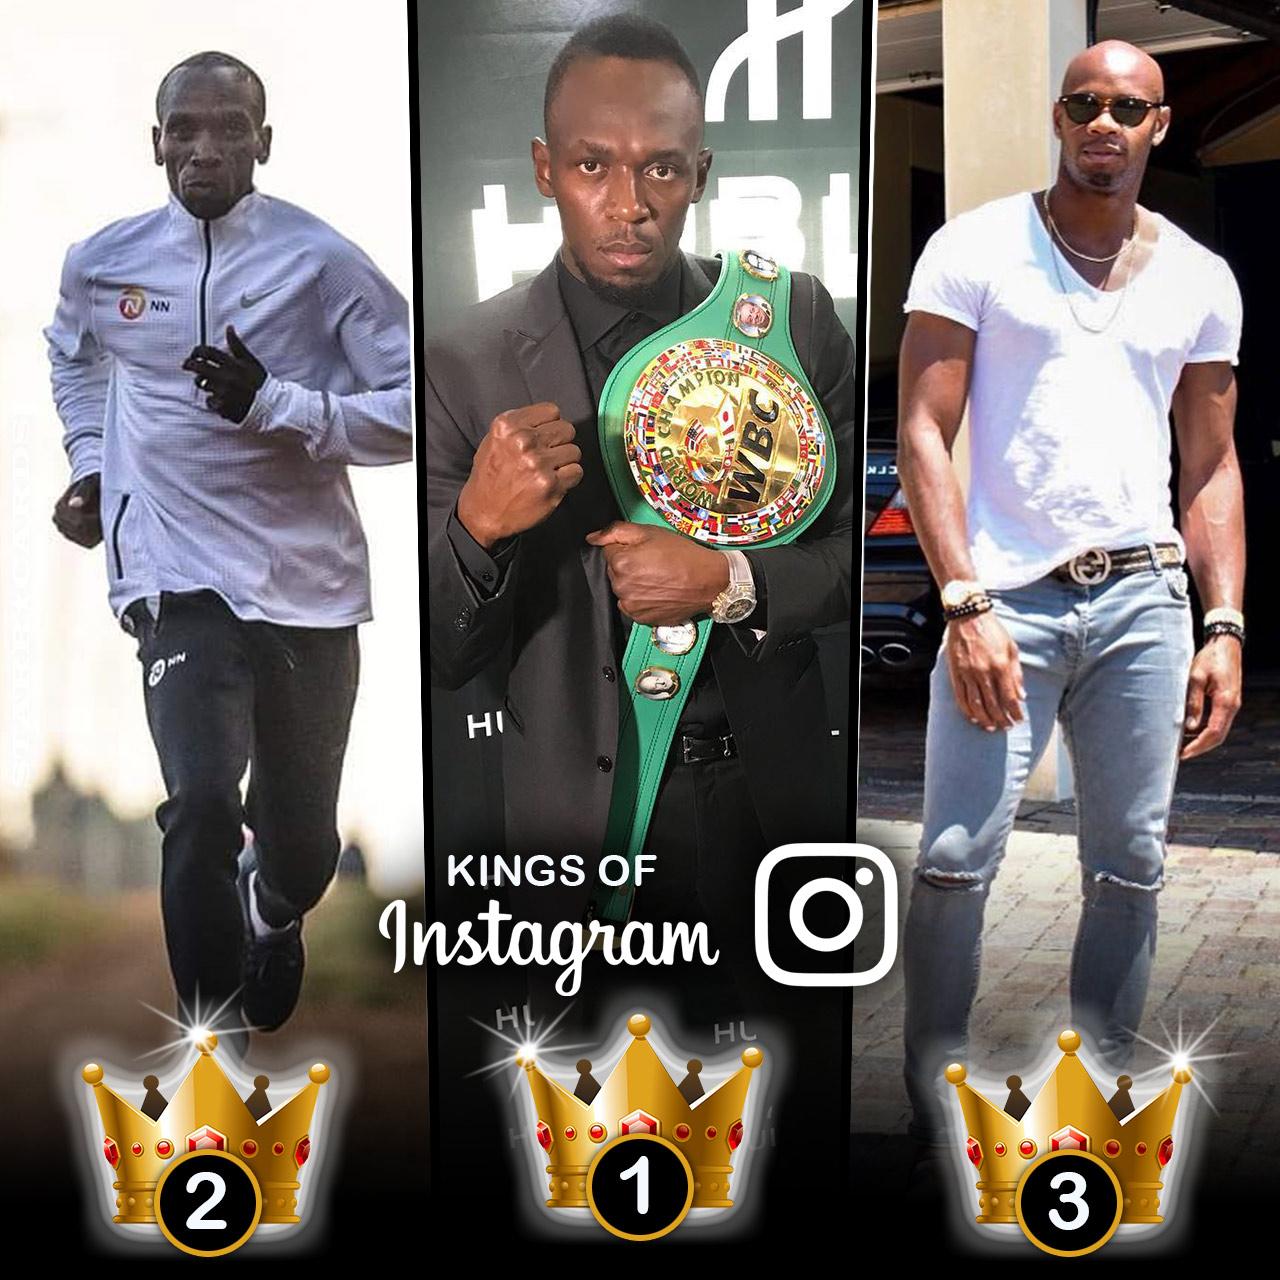 Kings Of Instagram Usain Bolt Eliud Kipchoge Asafa Powell Top